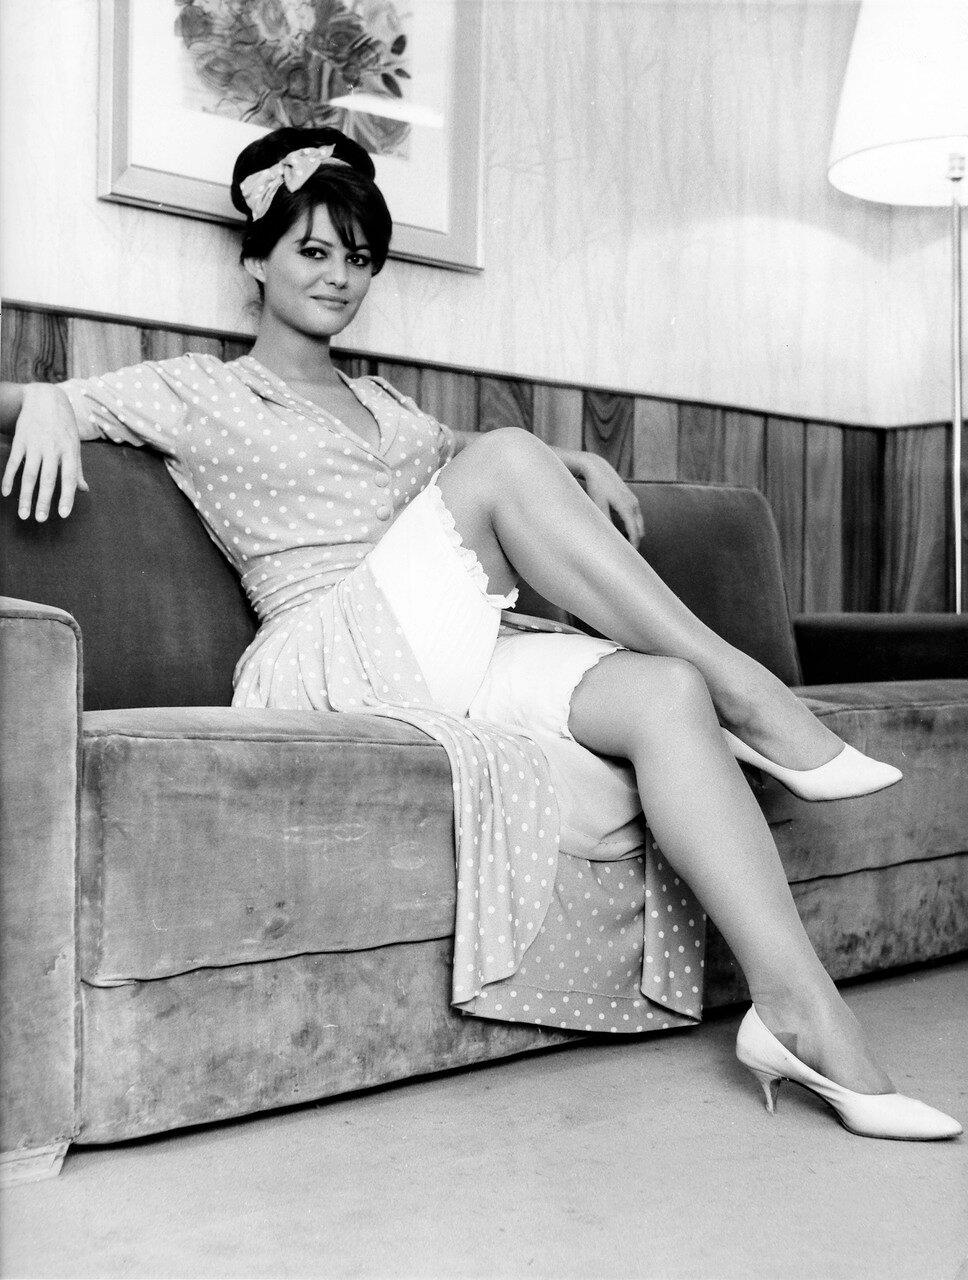 Claudia CARDINALE am Rande von Dreharbeiten, 1964